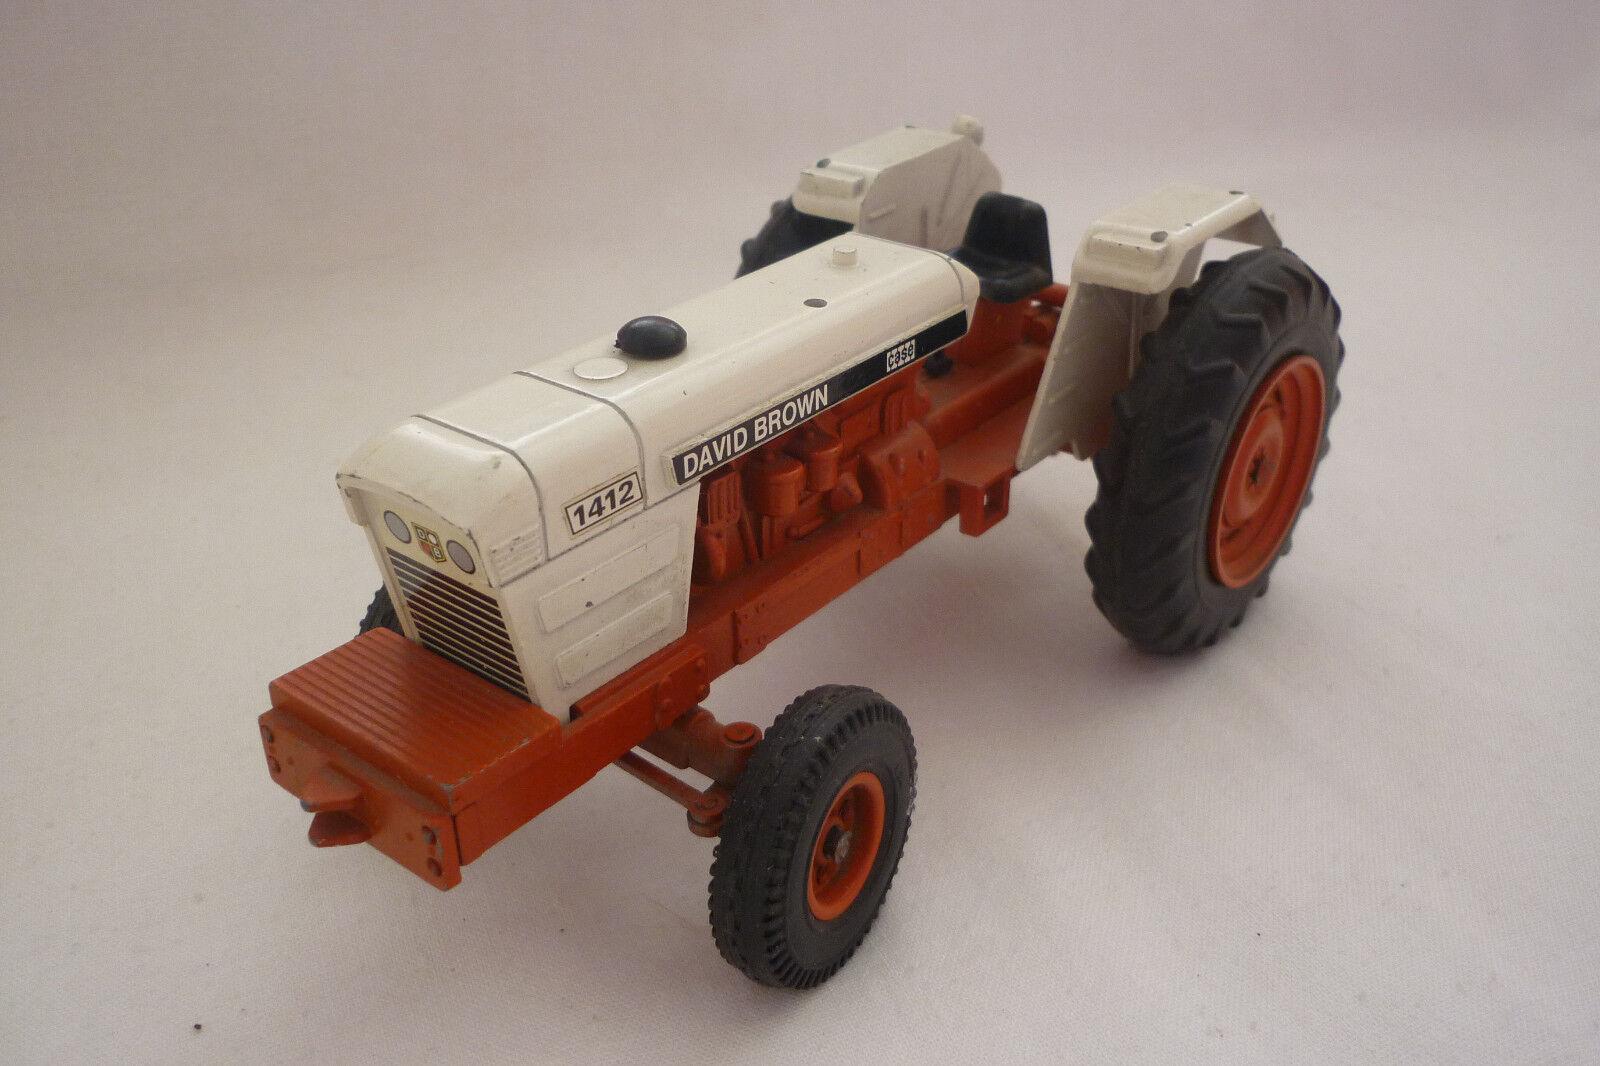 Nzg - Modéle en Métal - David marron 1412 - Tracteur - 1 25 - (7.BM-292)